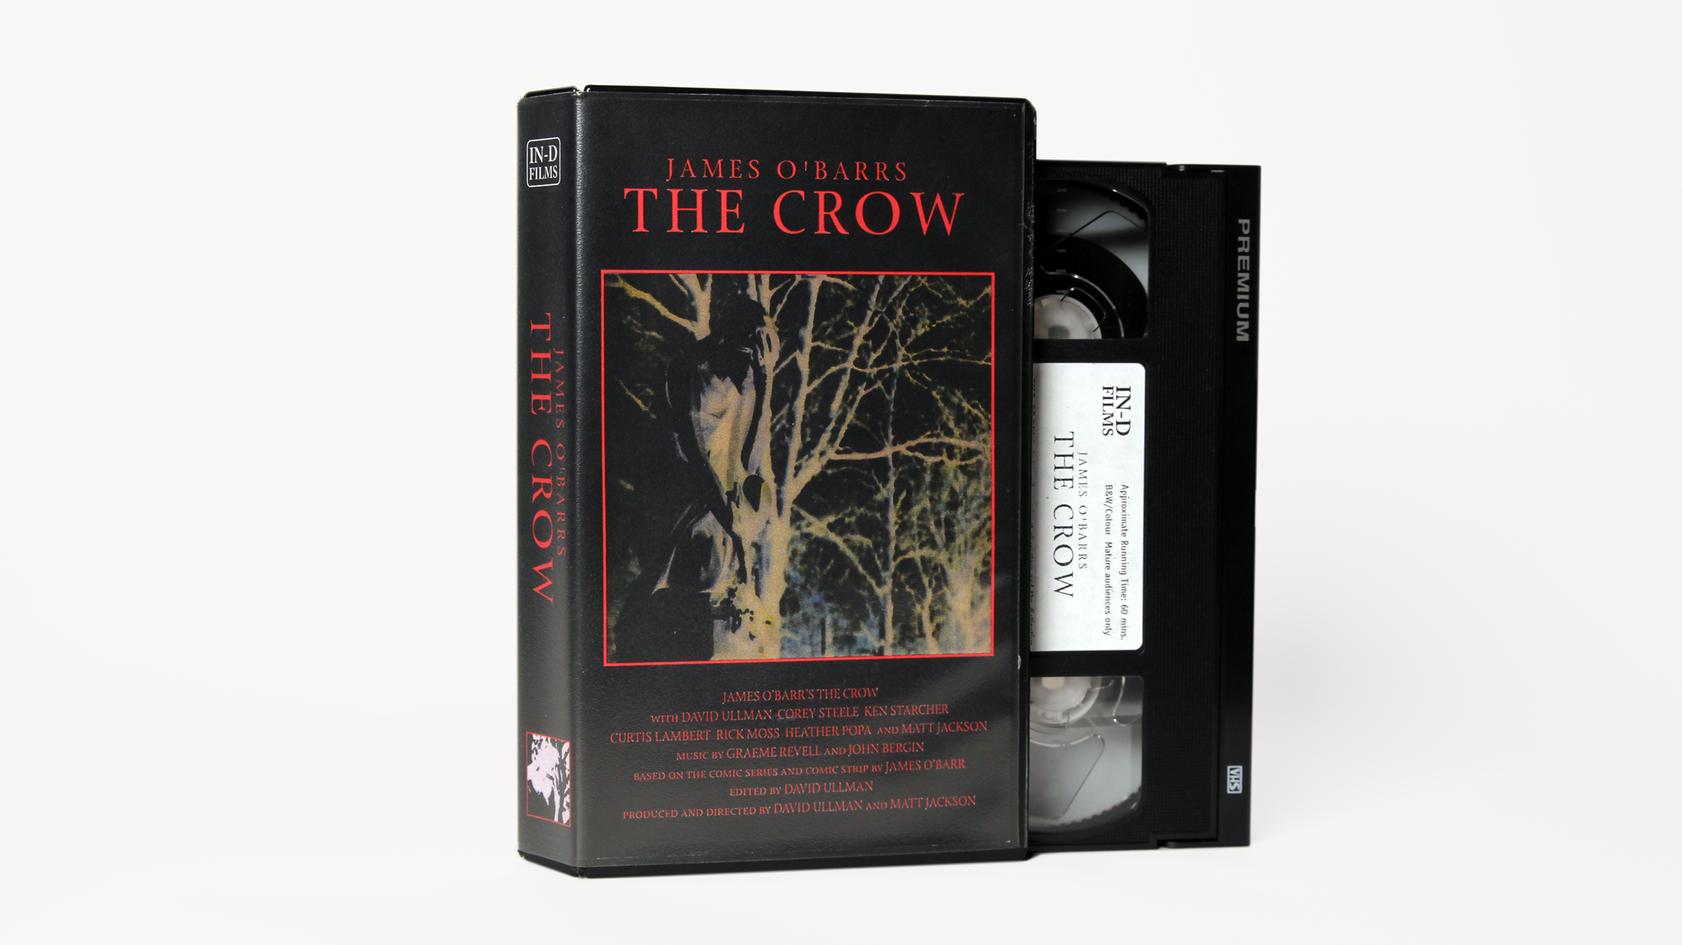 James O'Barr's The Crow VHS (1998)